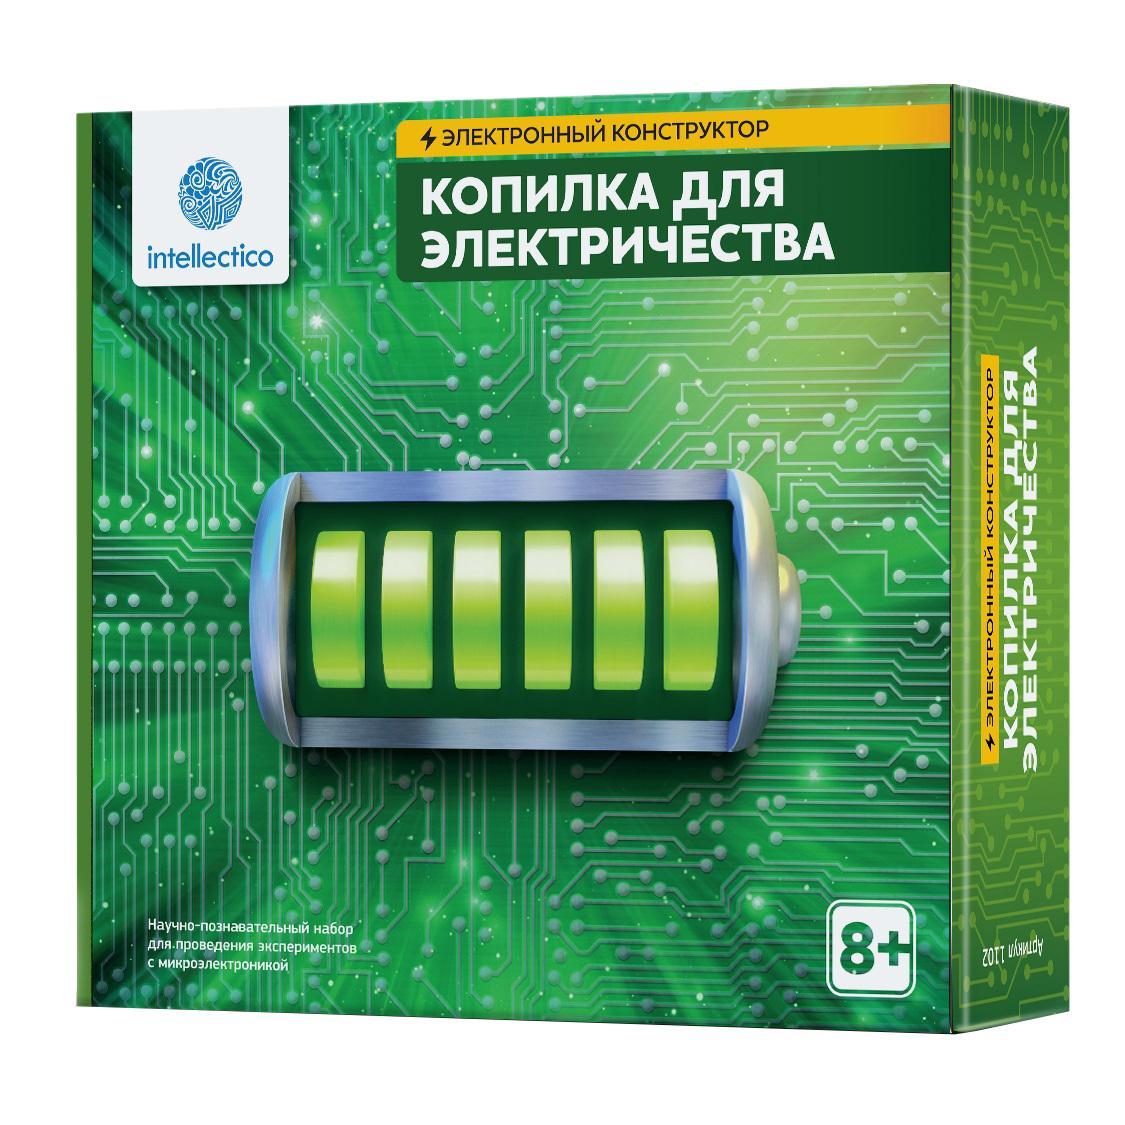 Набор INTELLECTICO 1102 Копилка для электричества